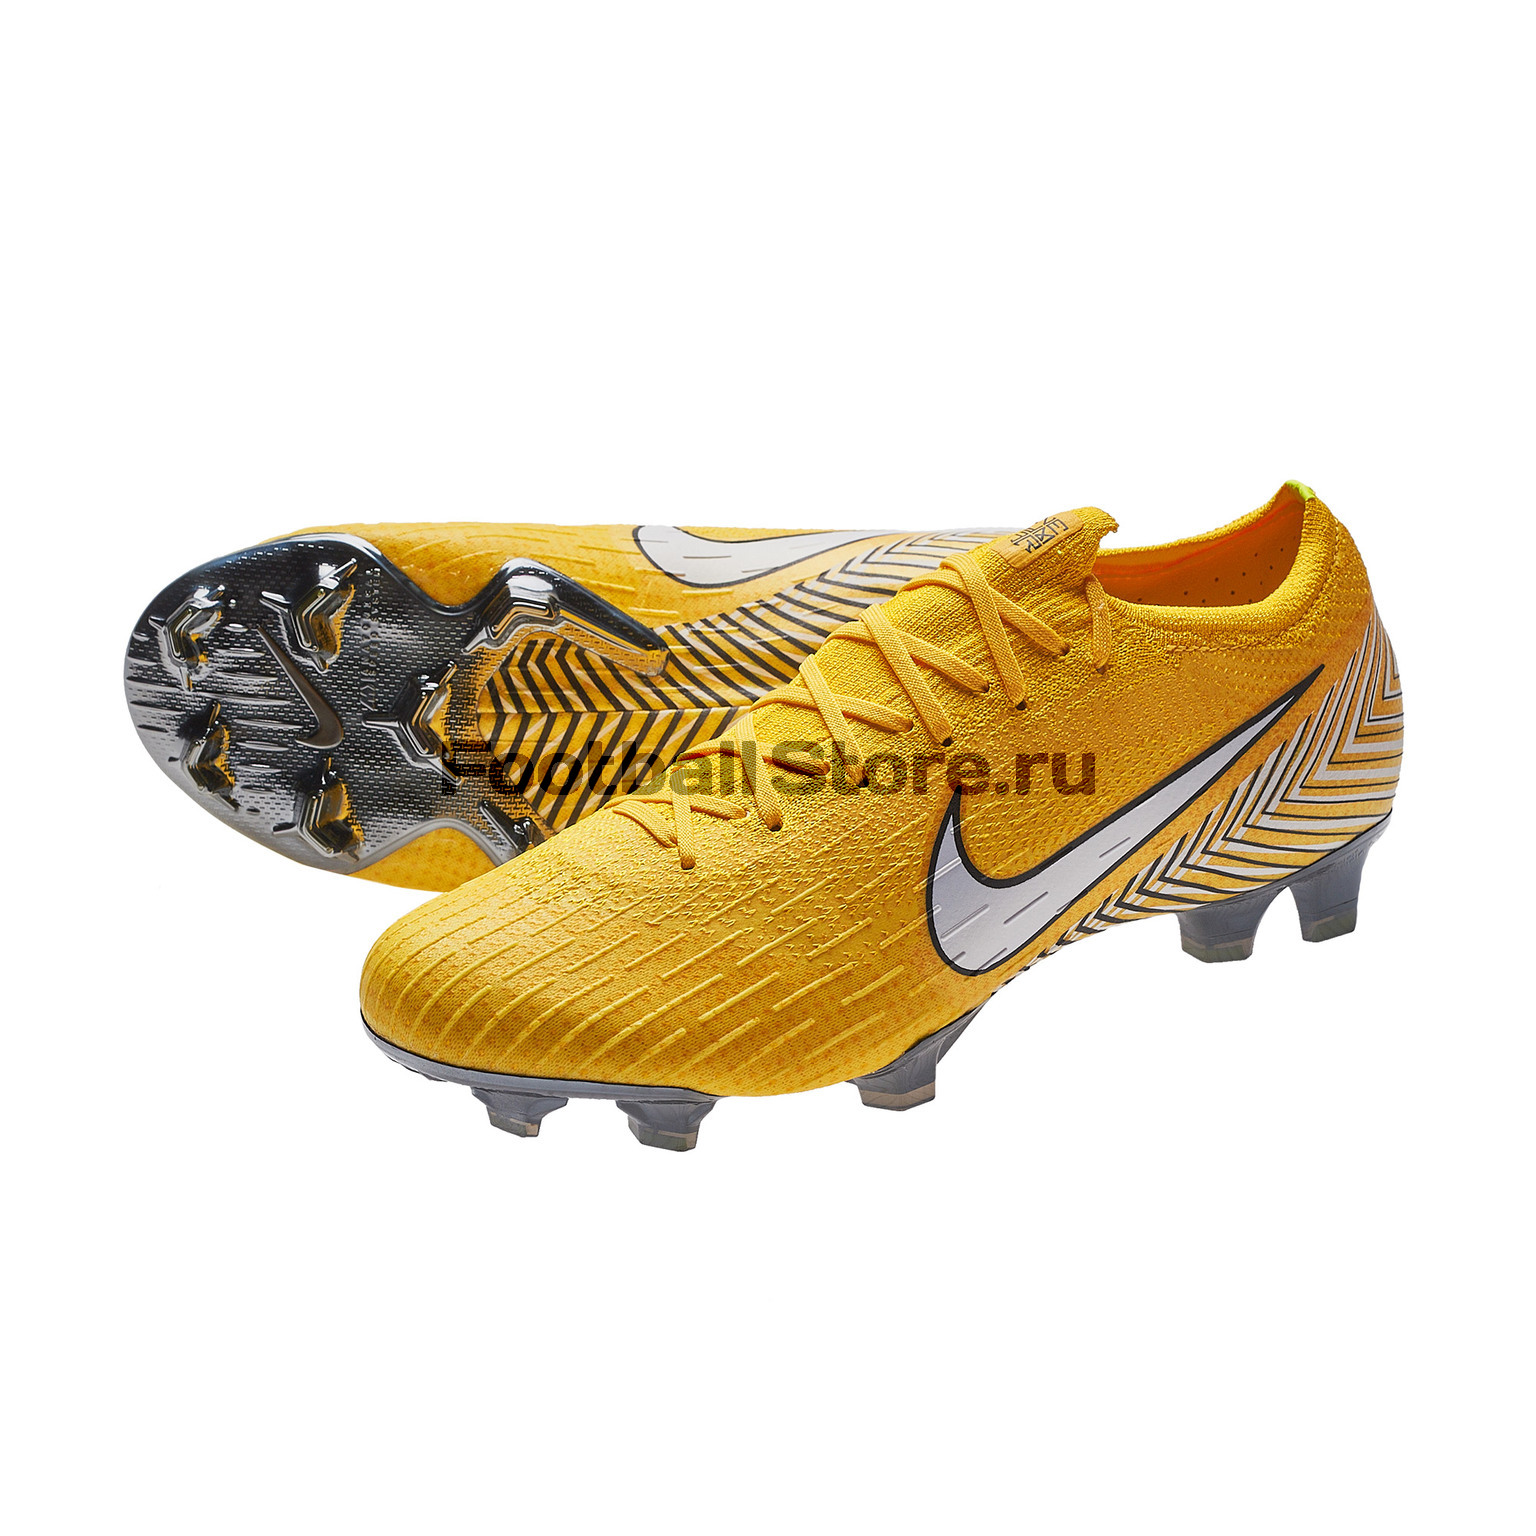 Бутсы Nike Vapor 12 Elite Neymar FG AO3126-710 бутсы nike mercurial victory iii fg 509128 800